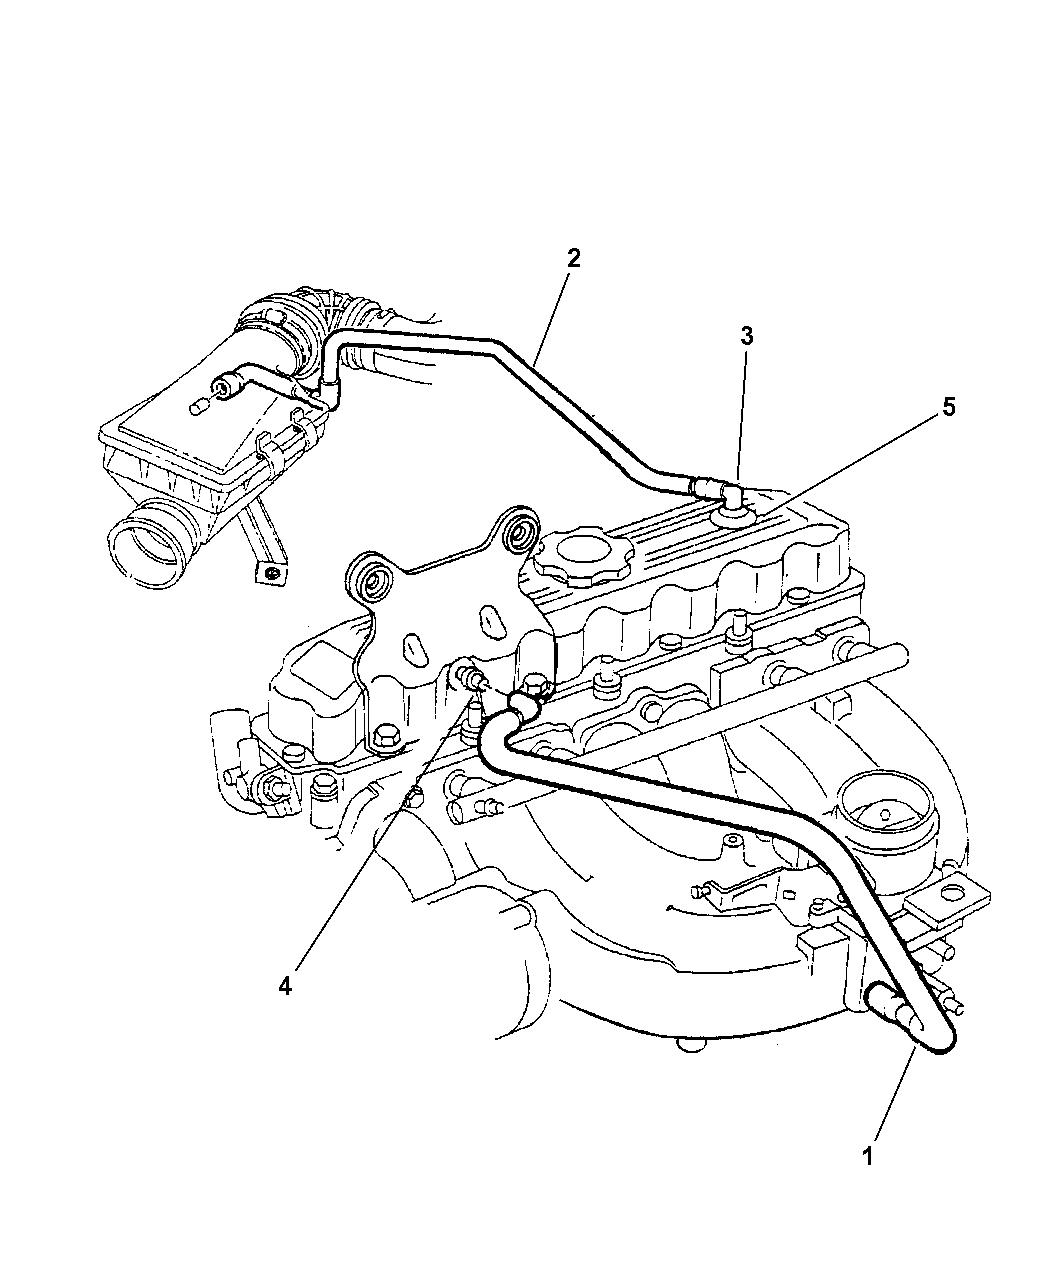 1998 Jeep Cherokee Crankcase Ventilation Mopar Parts Giant Transmission Wiring Plug Thumbnail 1